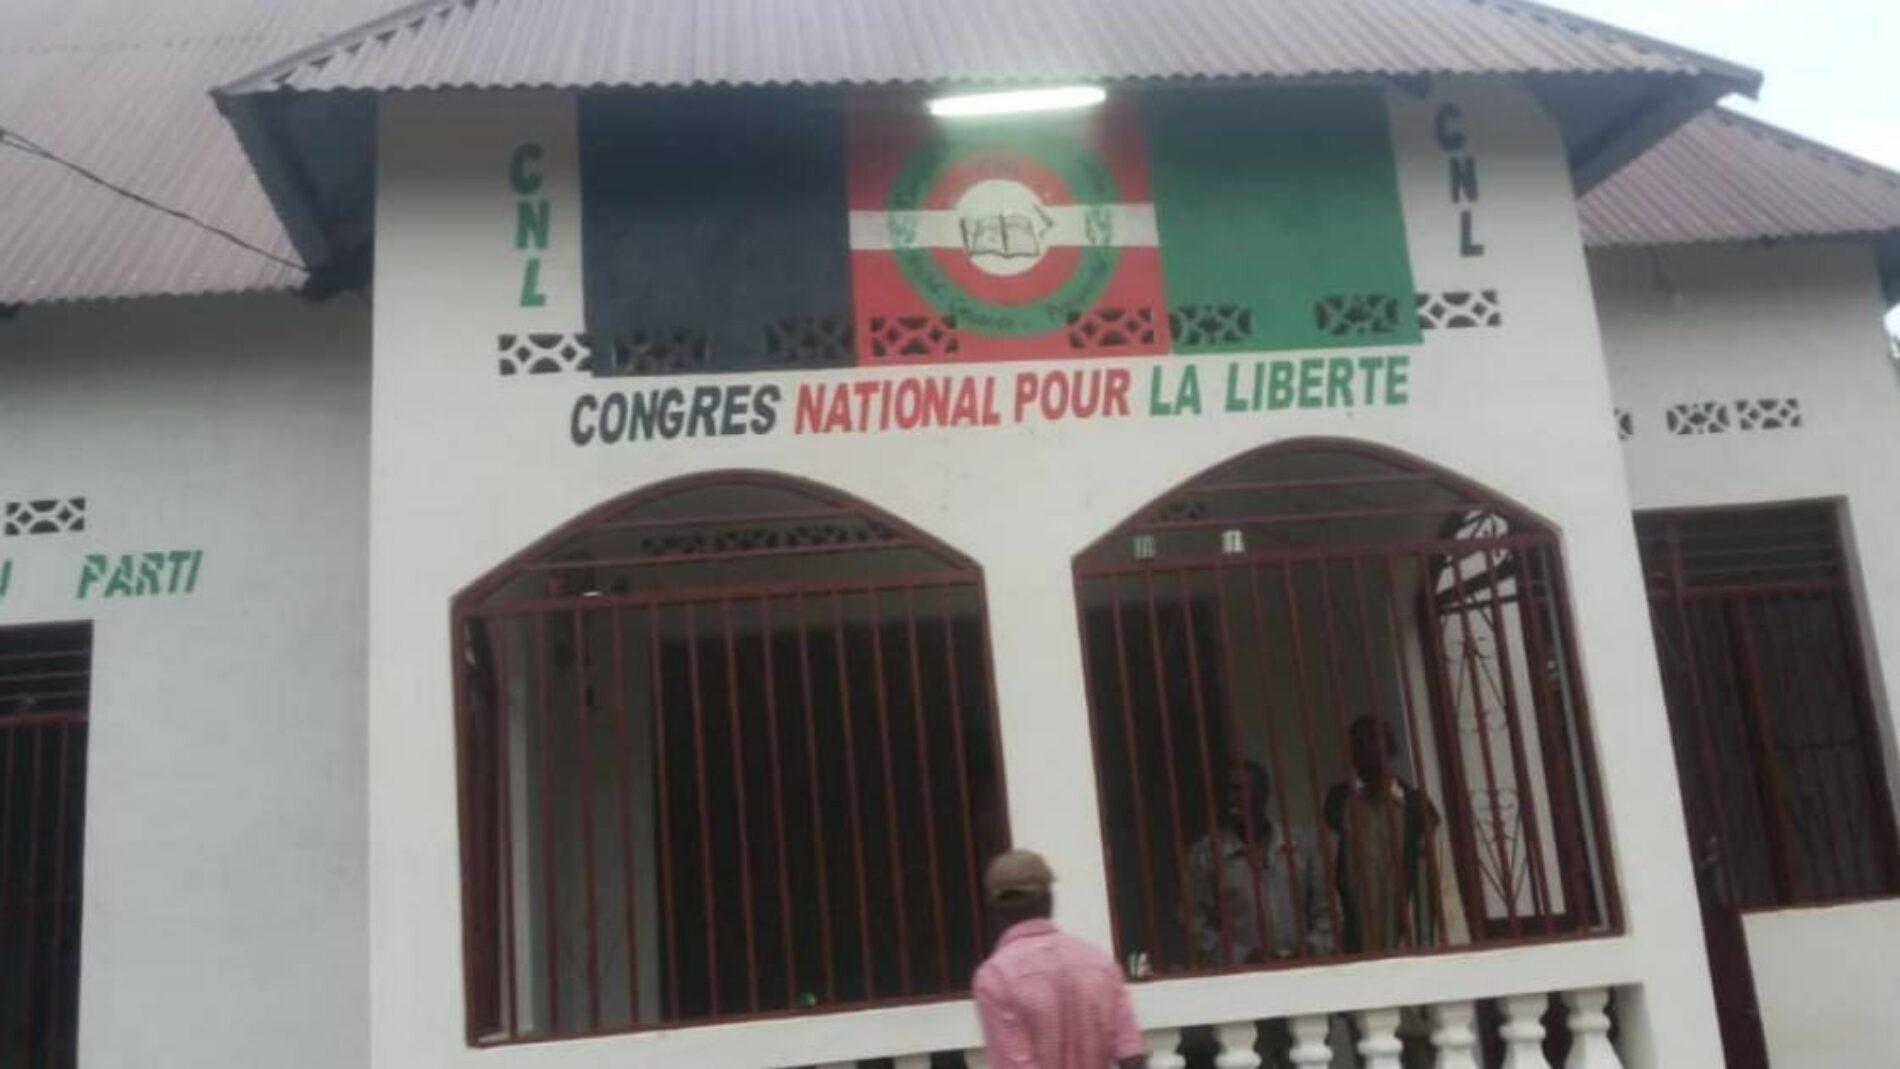 Maramvya (province de Bujumbura) : six jeunes opposants détenus arbitrairement selon le CNL